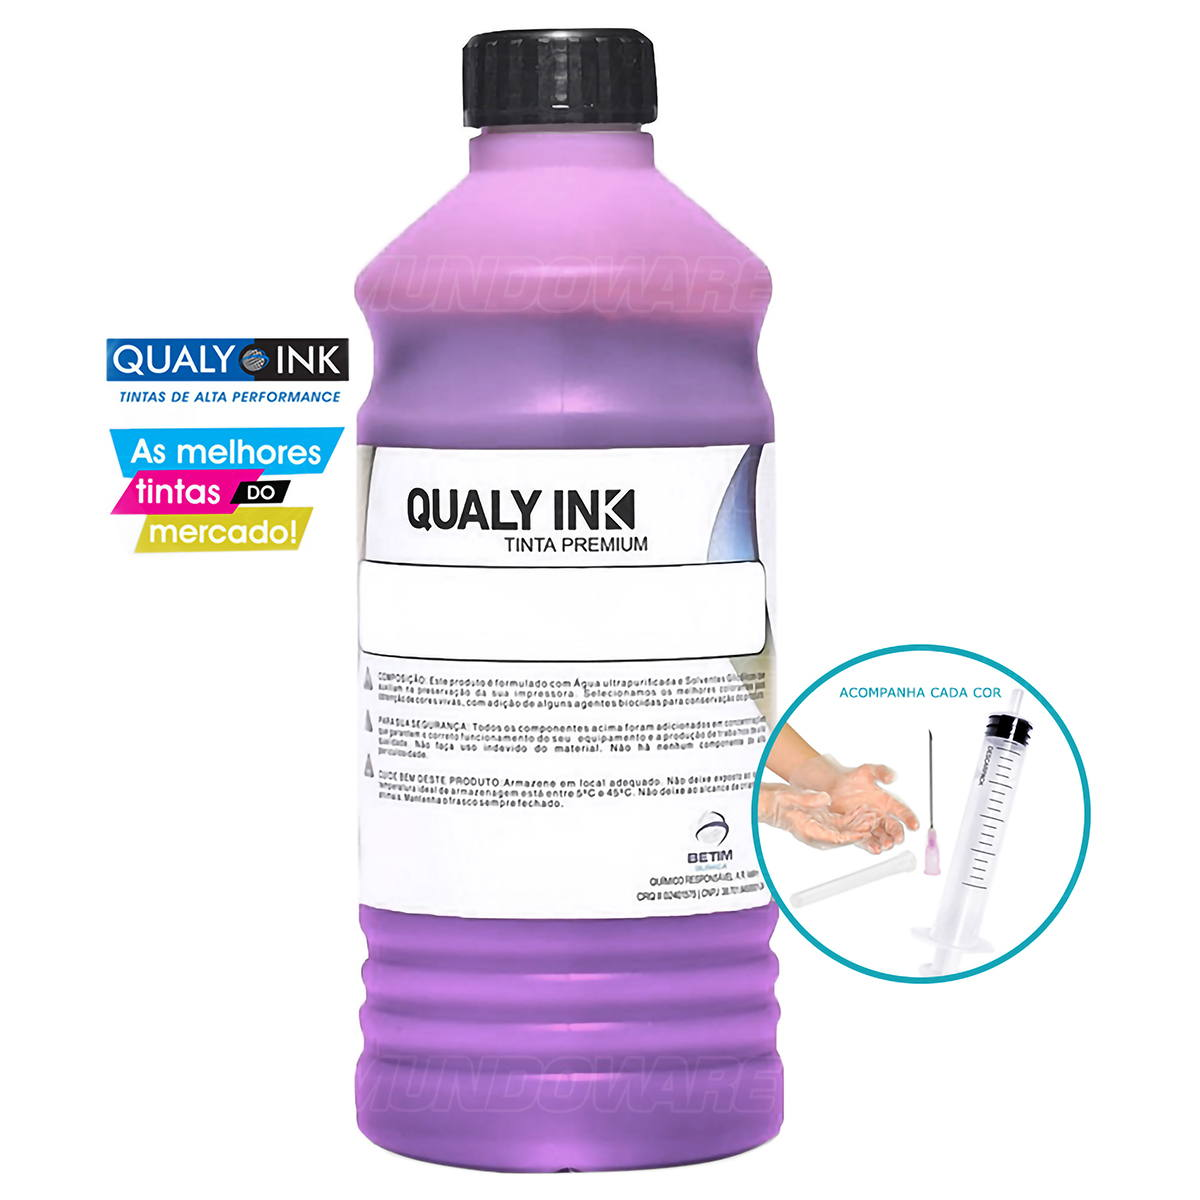 Tinta Corante Qualy-Ink para Impressora Brother MFC-790cw 490cw 795cw 5890cn J6520dw J6510dw Magenta Refil 1L